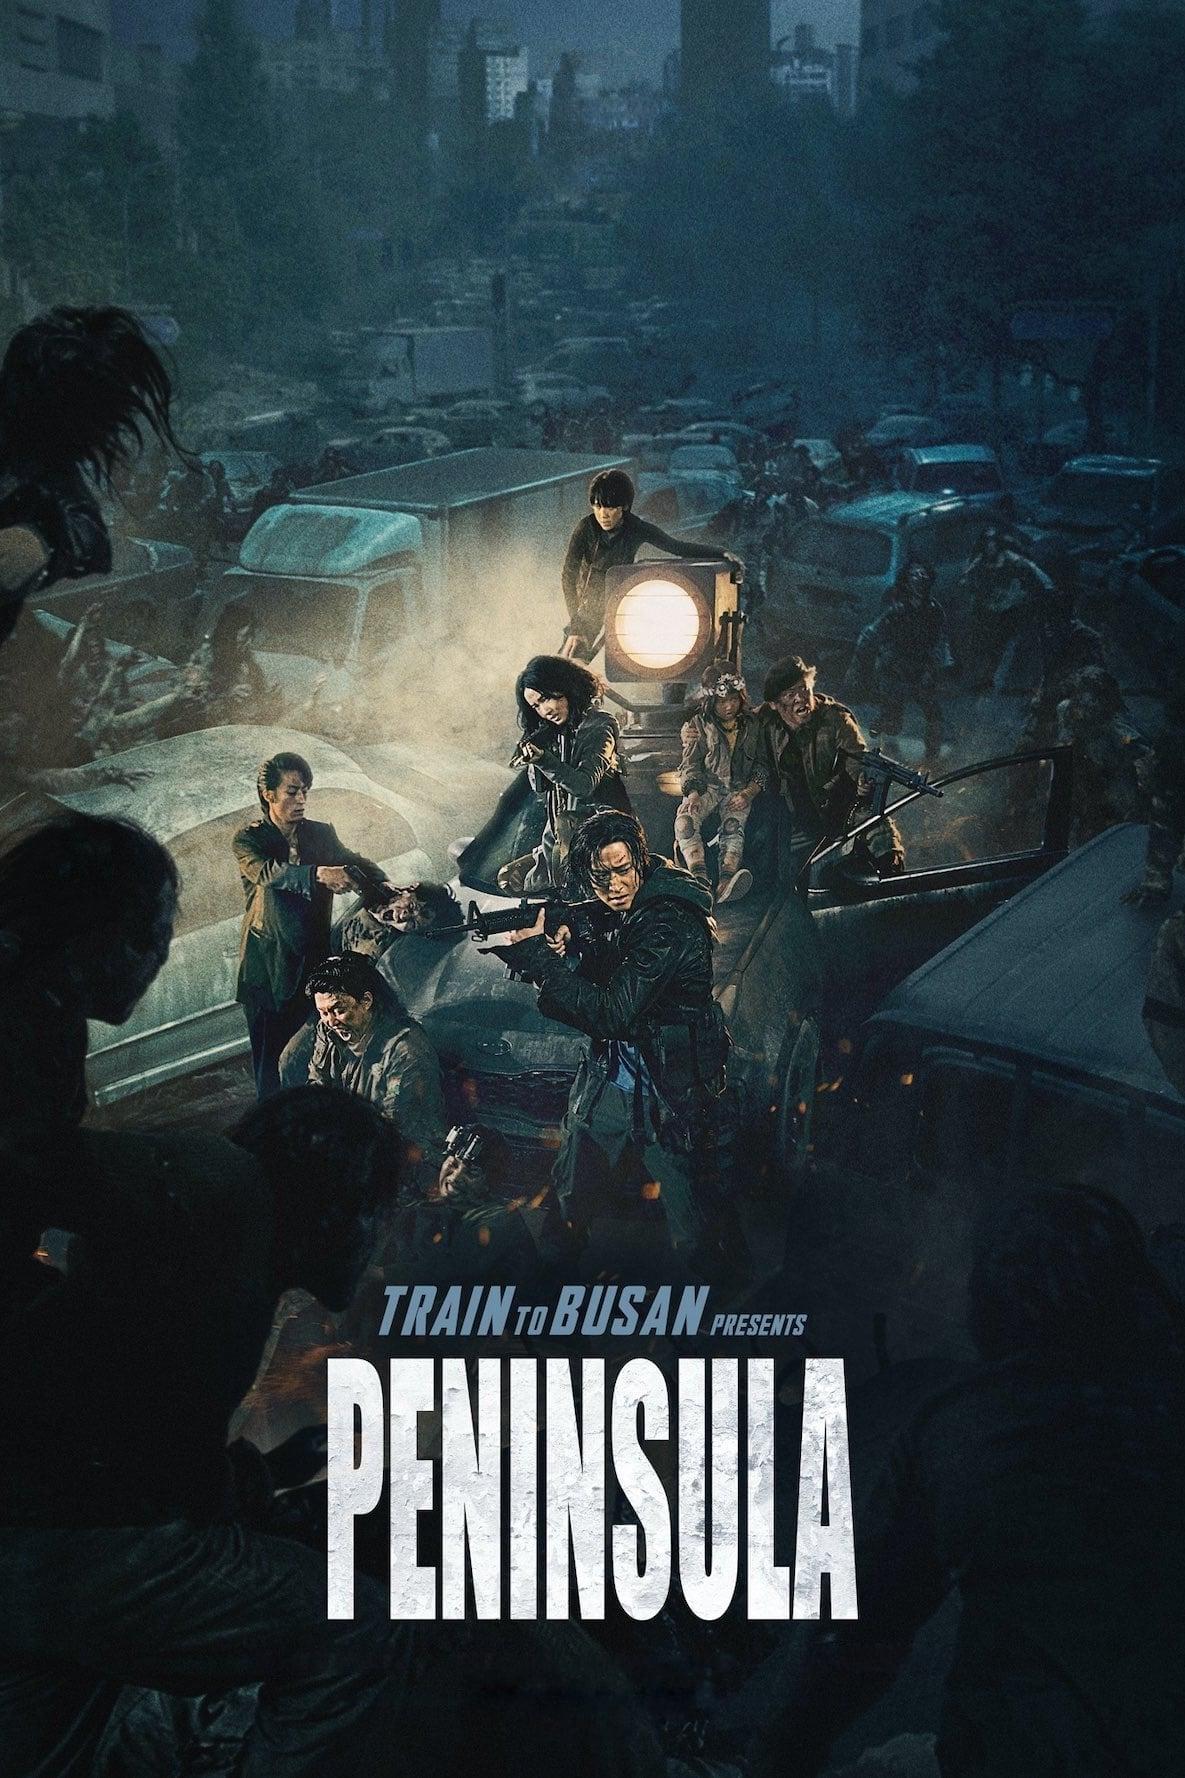 Download Film Train to Busan 2 : Peninsula (2020) Sub Indo ...